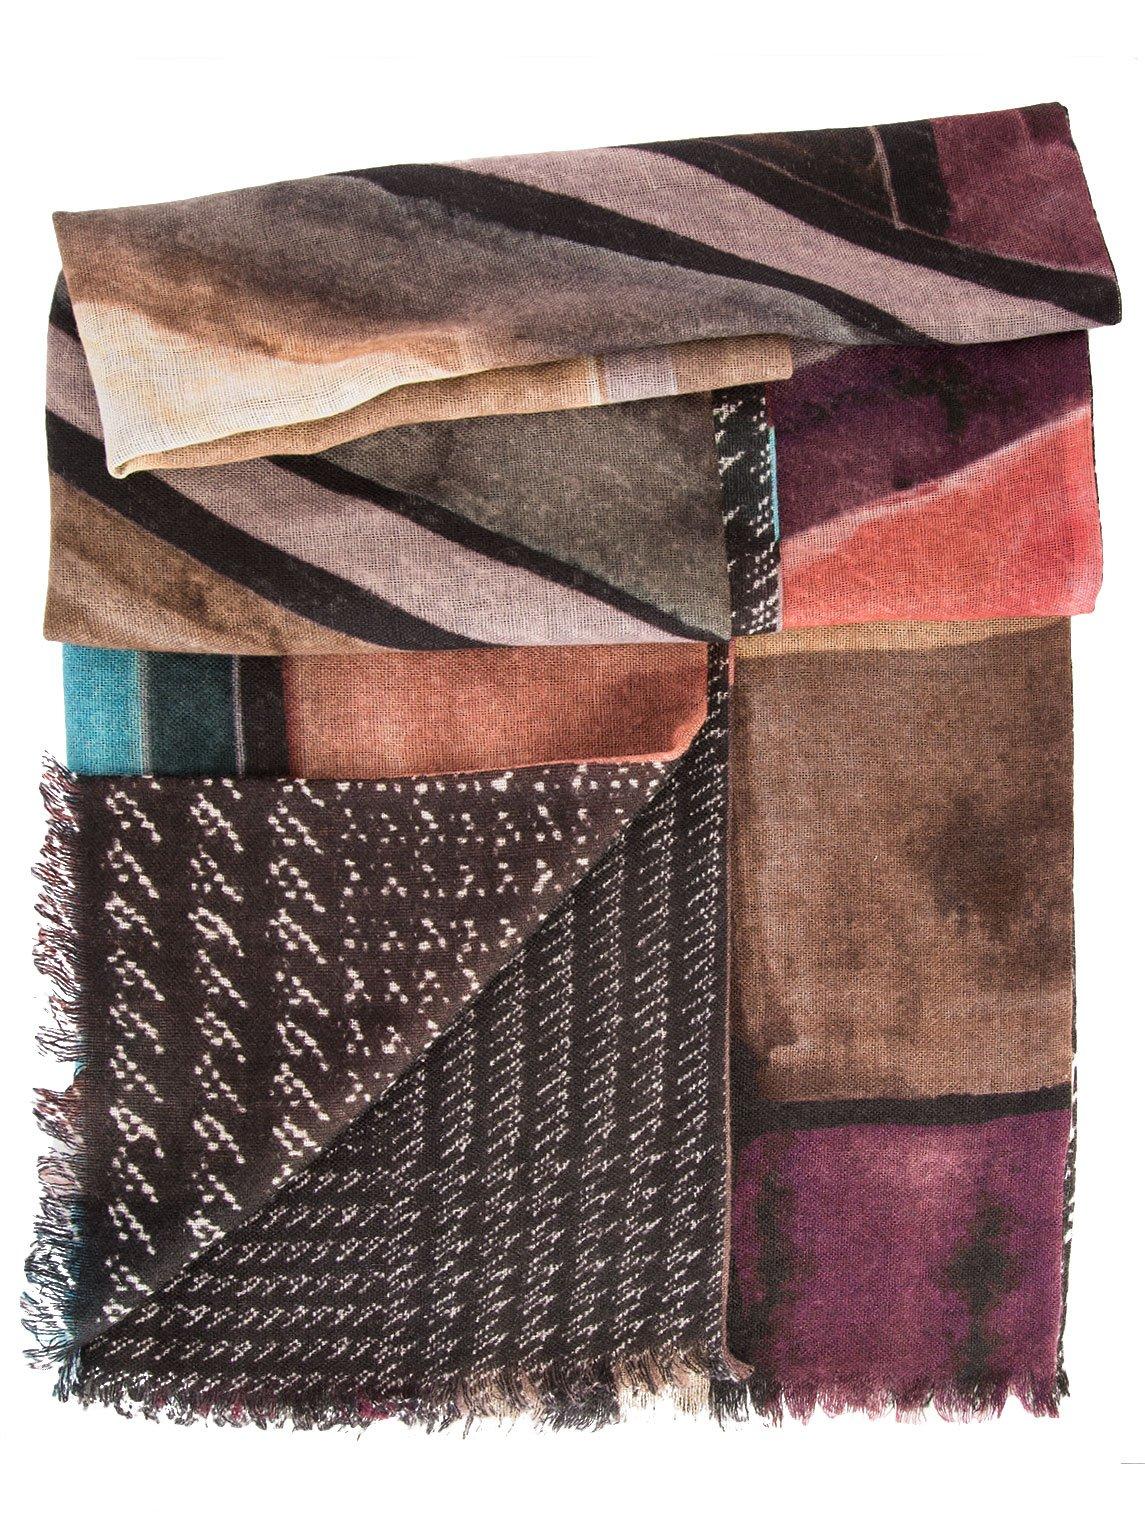 Elizabetta Womens Double Sided Wool Scarf Wrap Shawl, Made in Italy